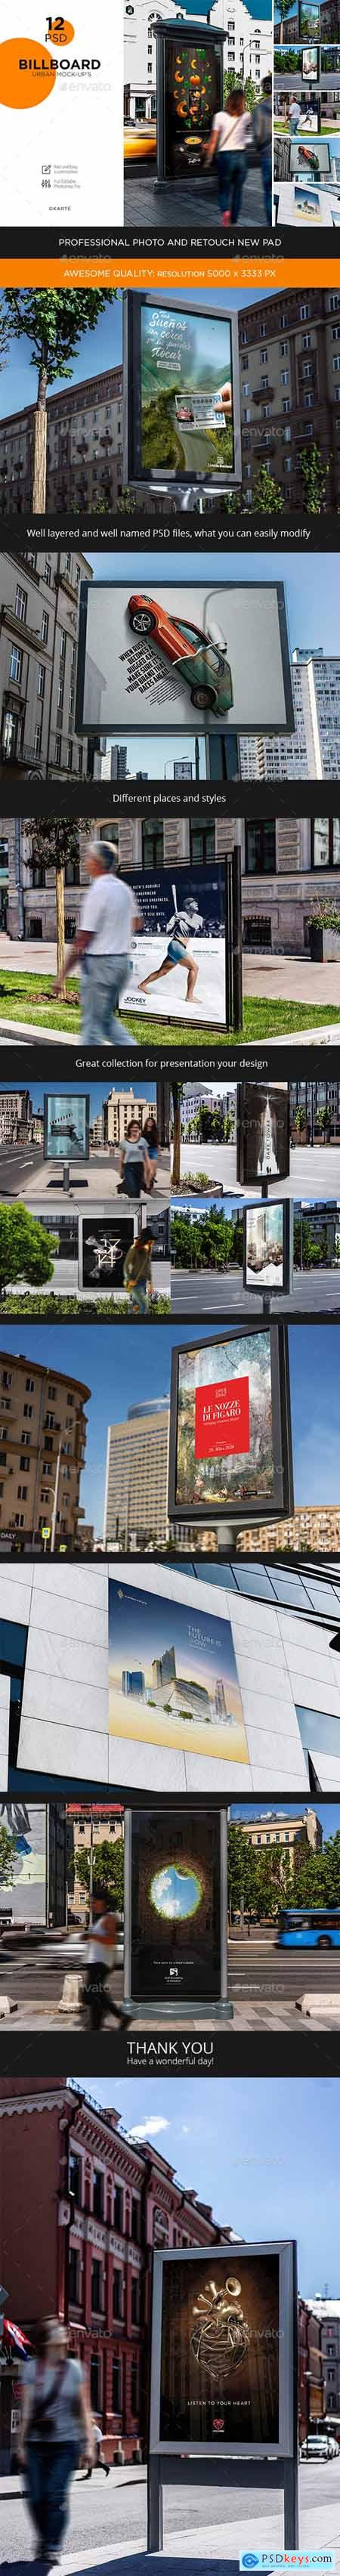 Billboards Urban Mock-Up 23954794